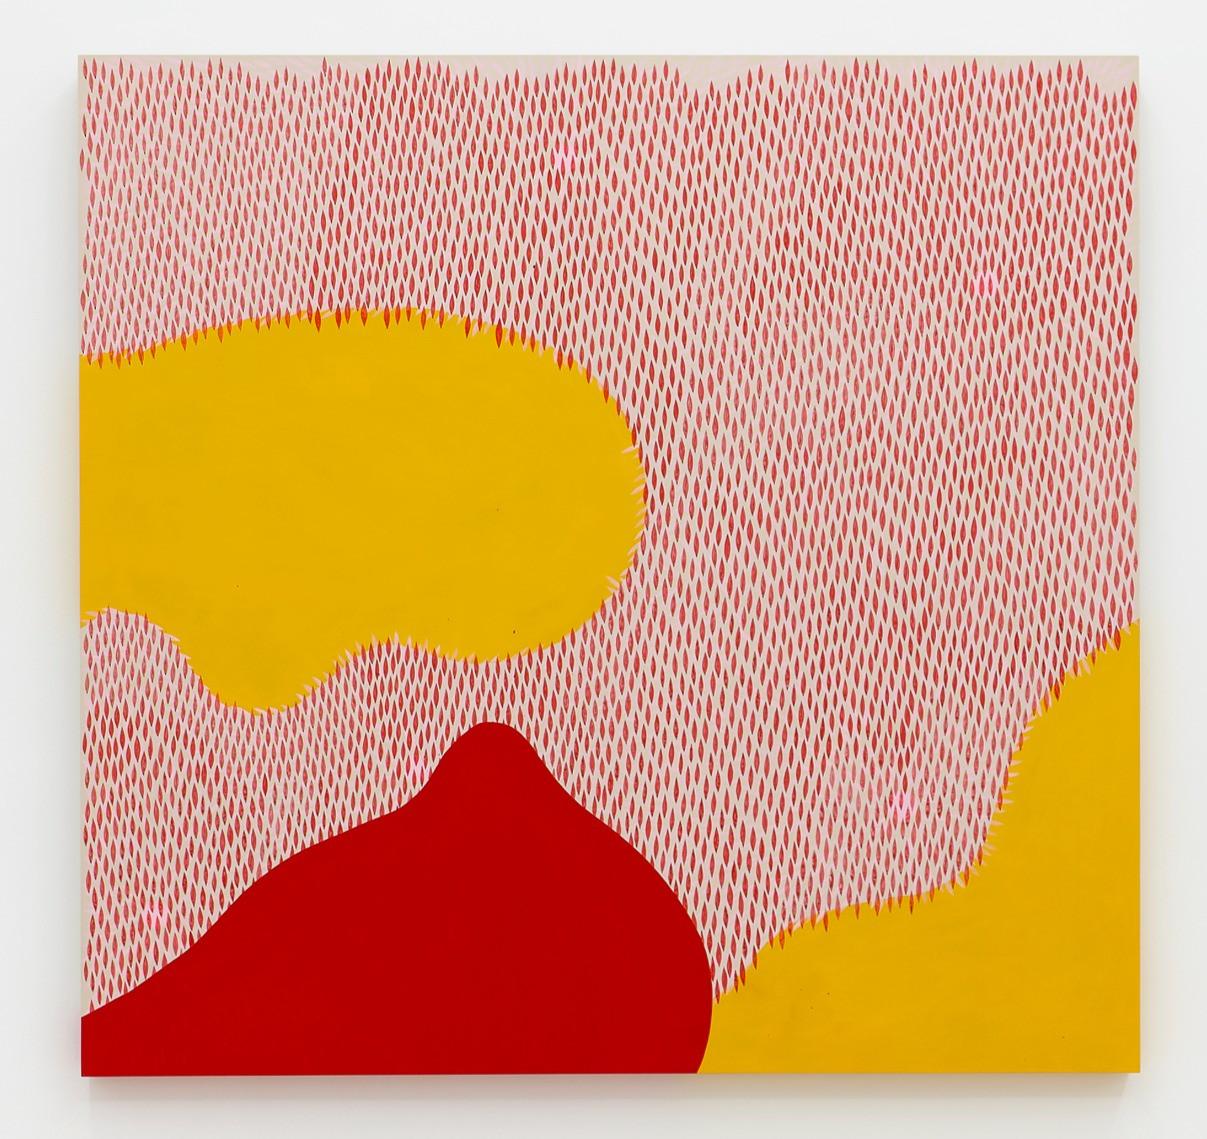 Julia Chiang  Mush More, 2020   Acrylic on wood panel  48 x 48 inches